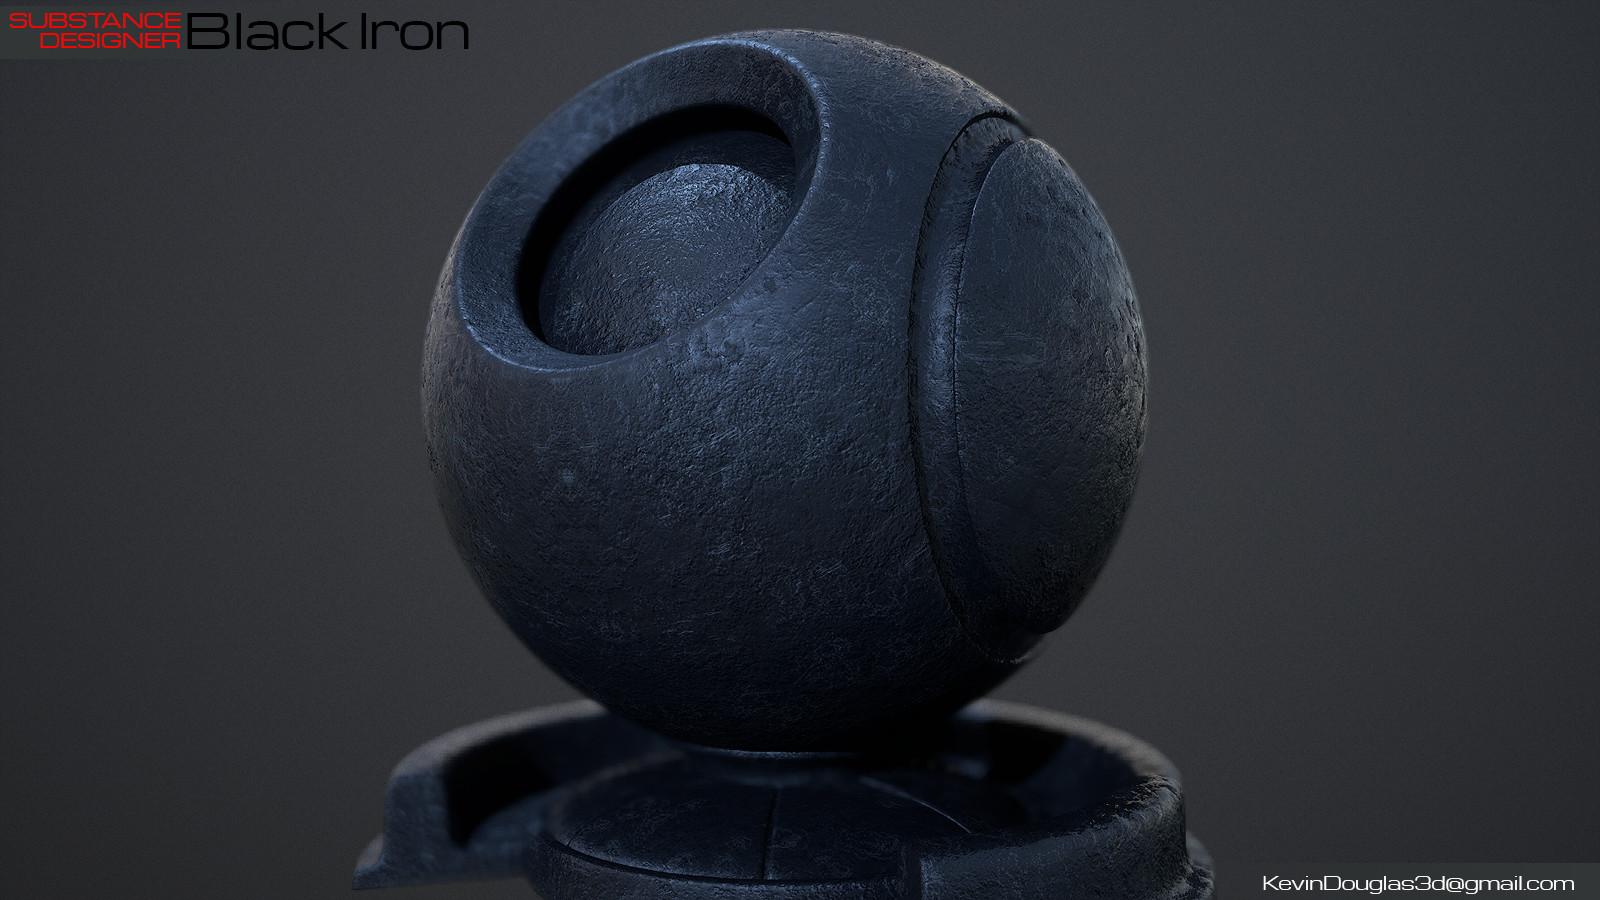 Black Iron Marmoset Render